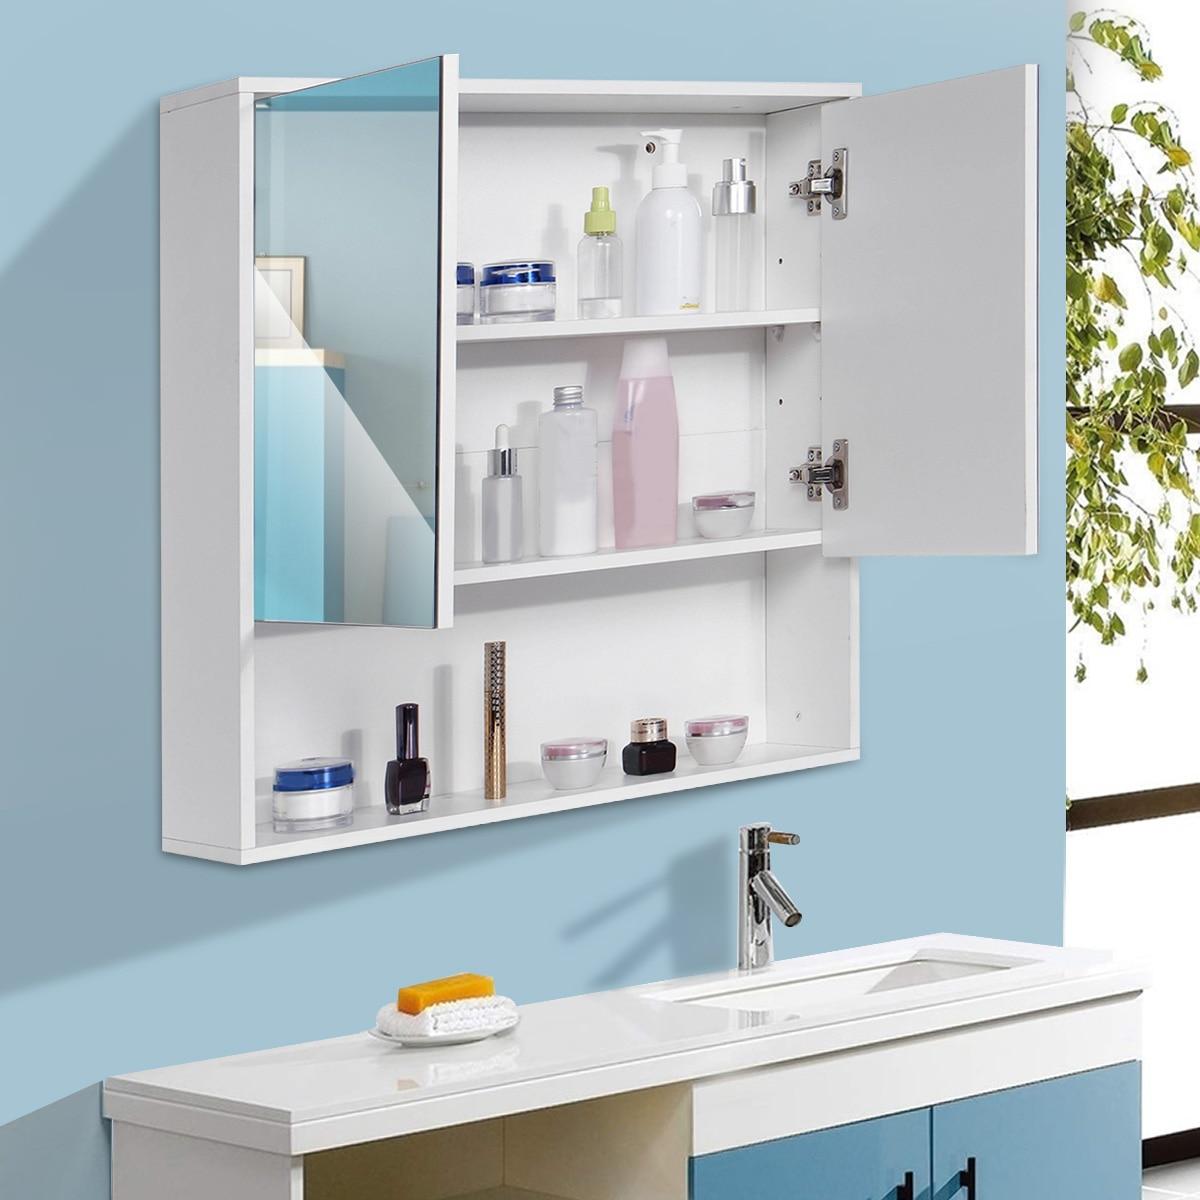 Bathroom Cabinet 60x60cm Wall Mounted Bathroom Mirror CabinetsToilet Furniture  Cupboard Shelf Storager Modern Style UK Stock